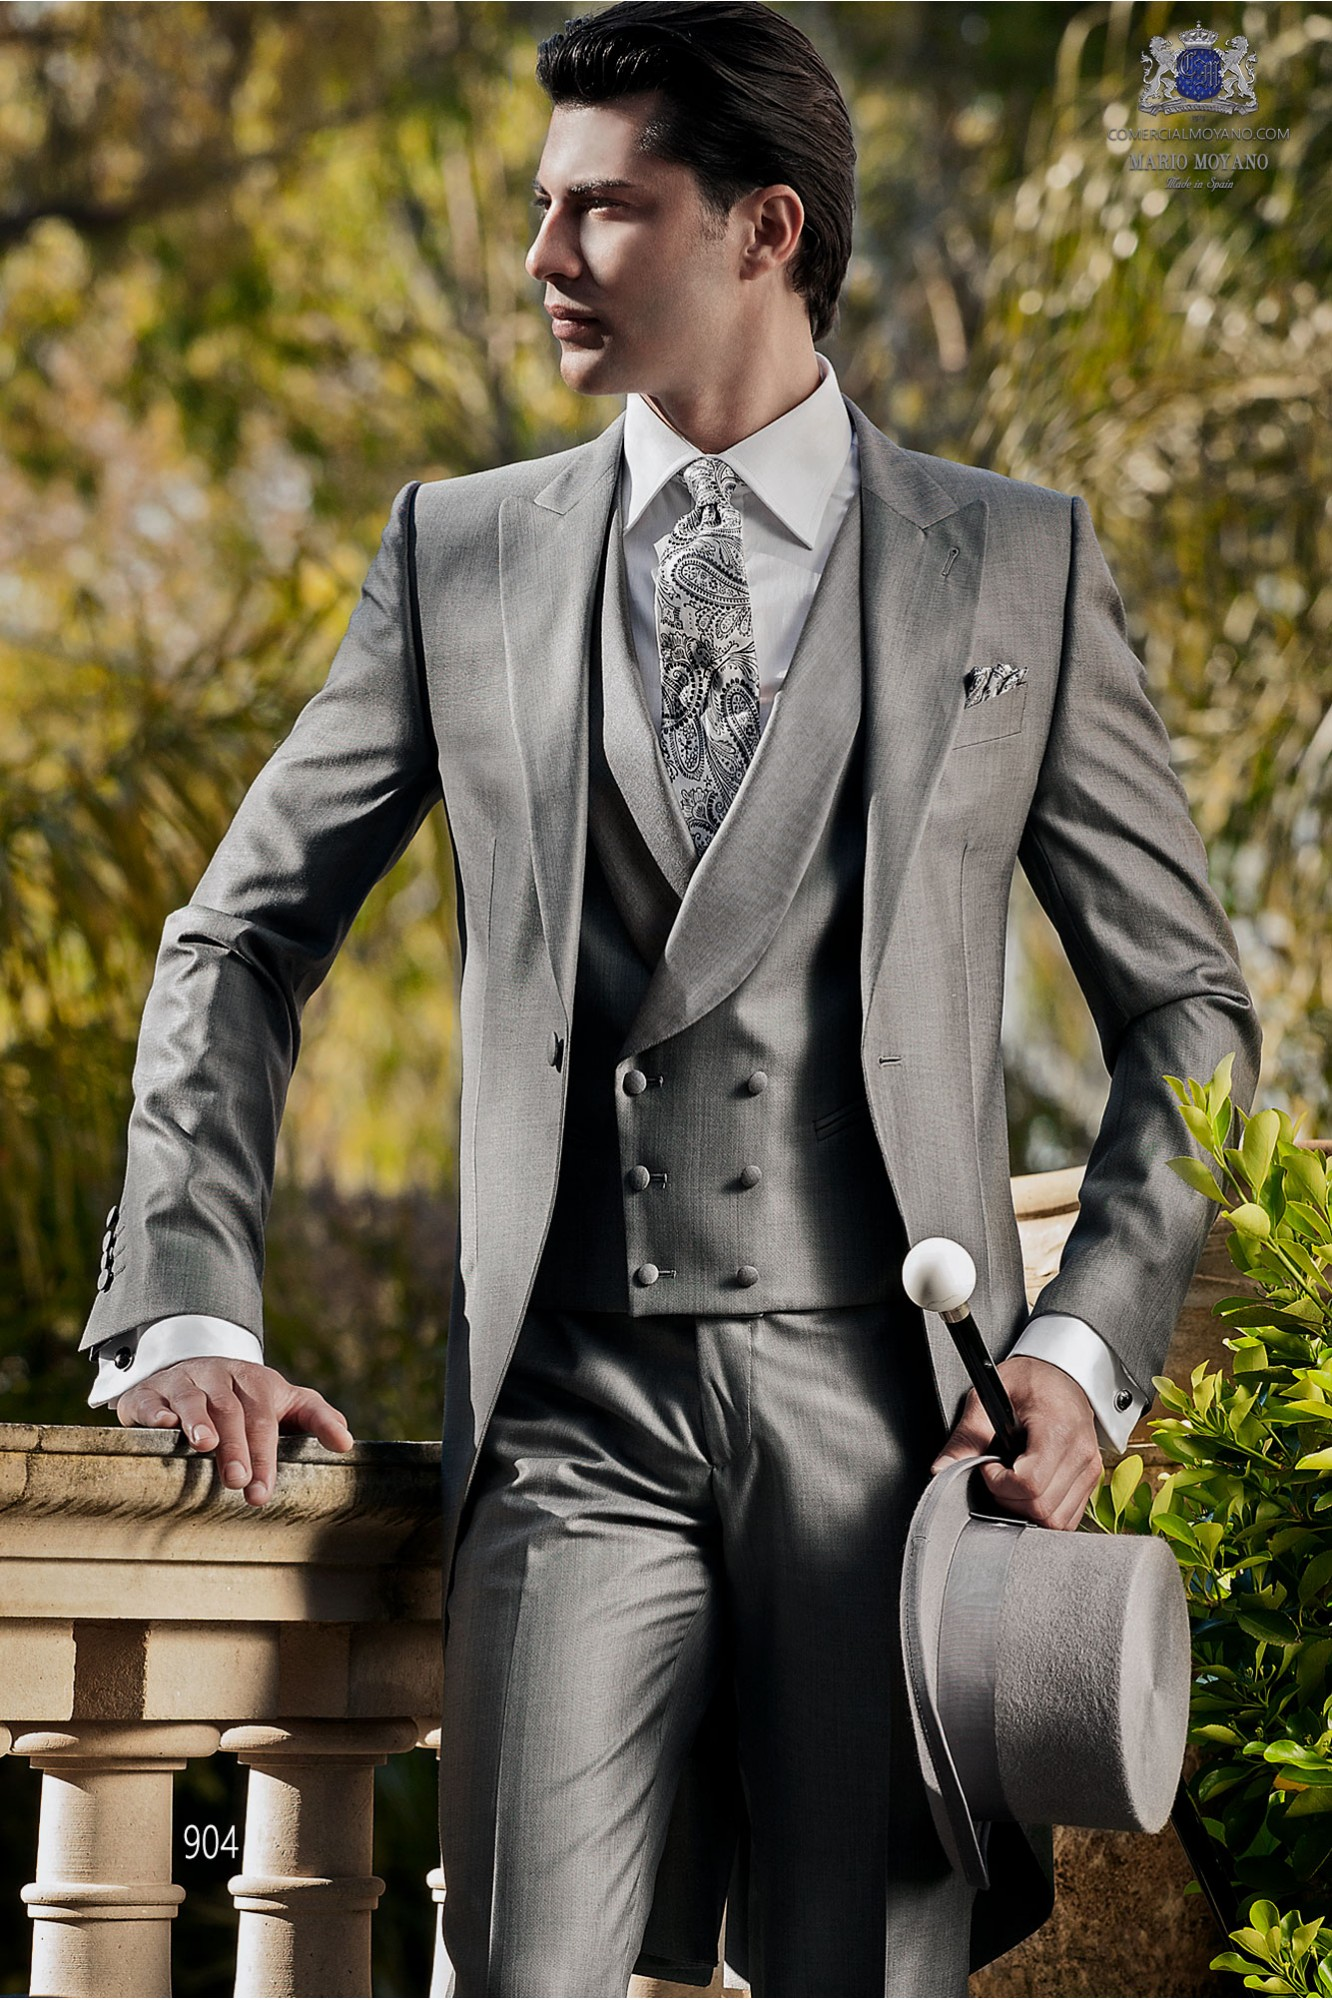 Italienne costume de matin de mariage gris sur mesure en tissu de soie de laine, de style 904 Ottavio Nuccio Gala, collection Gentleman.